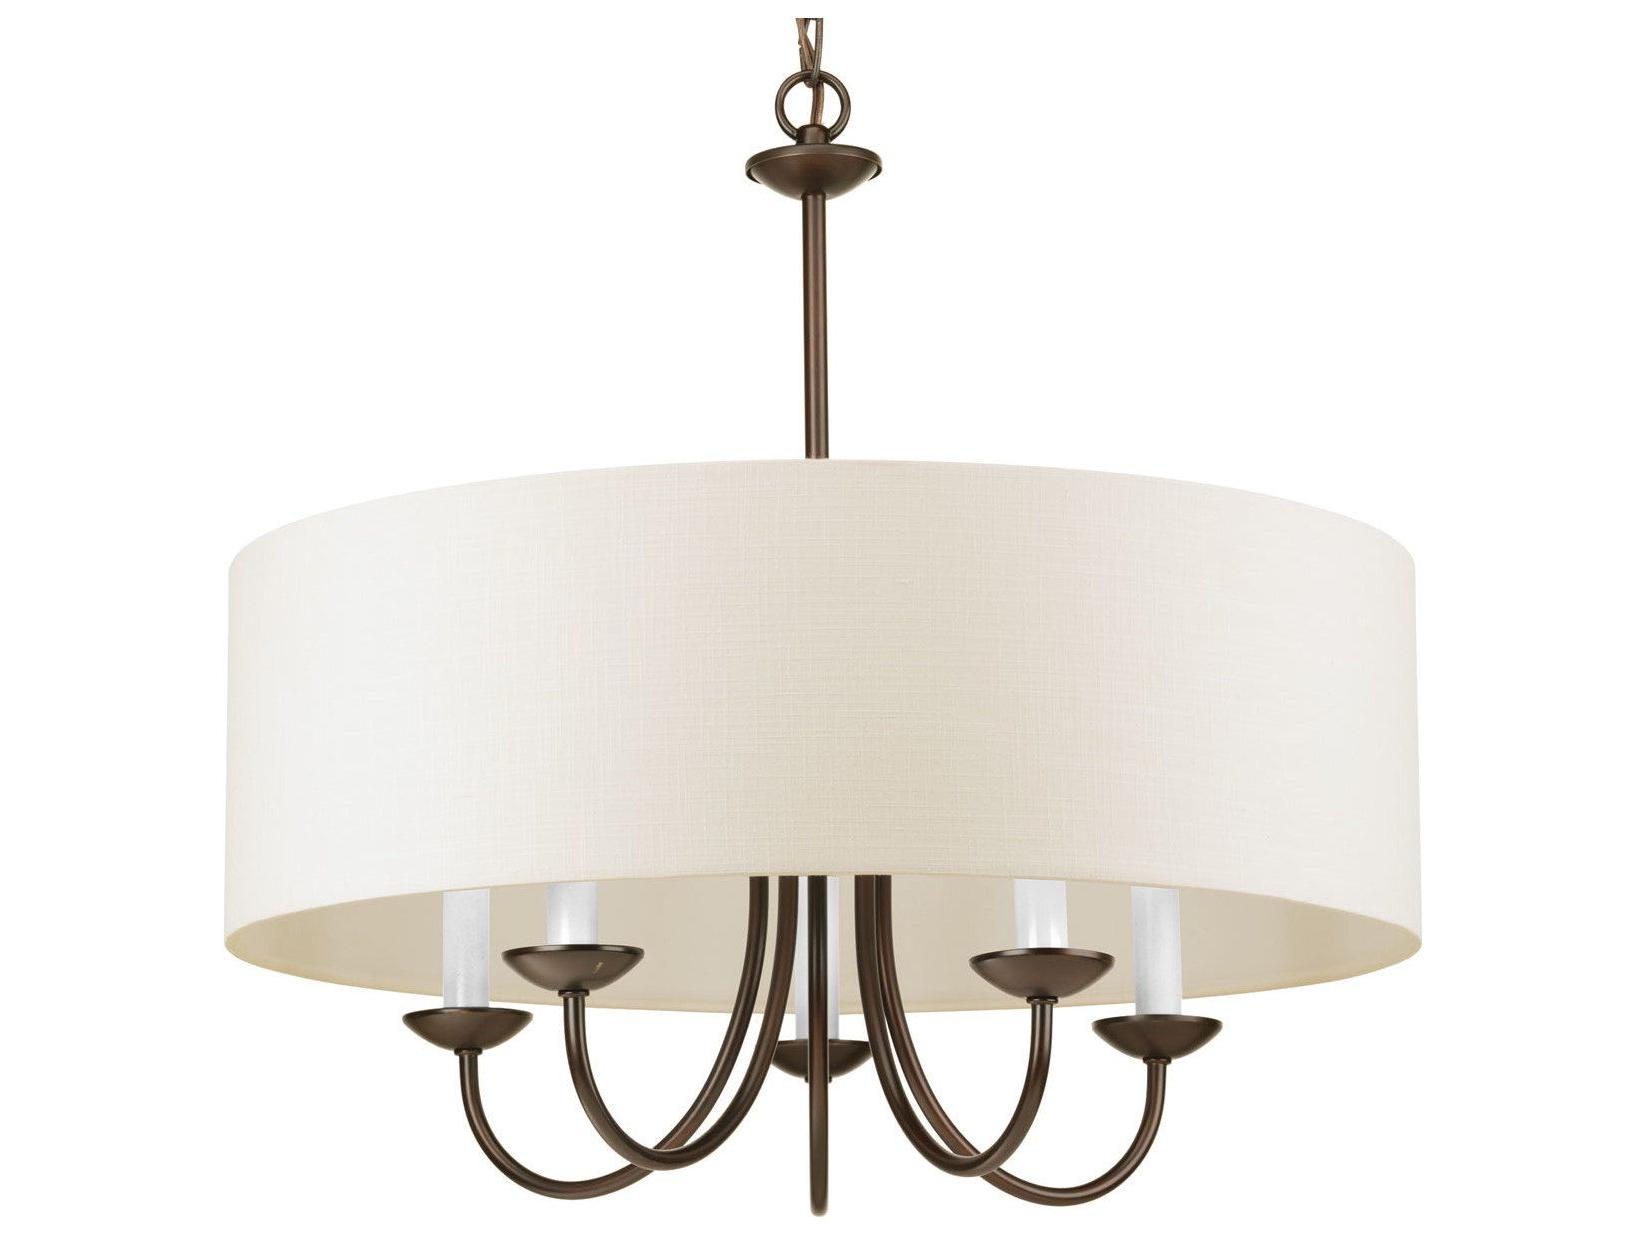 Lighting Ideas With Burton 5 Light Drum Chandeliers (View 14 of 20)